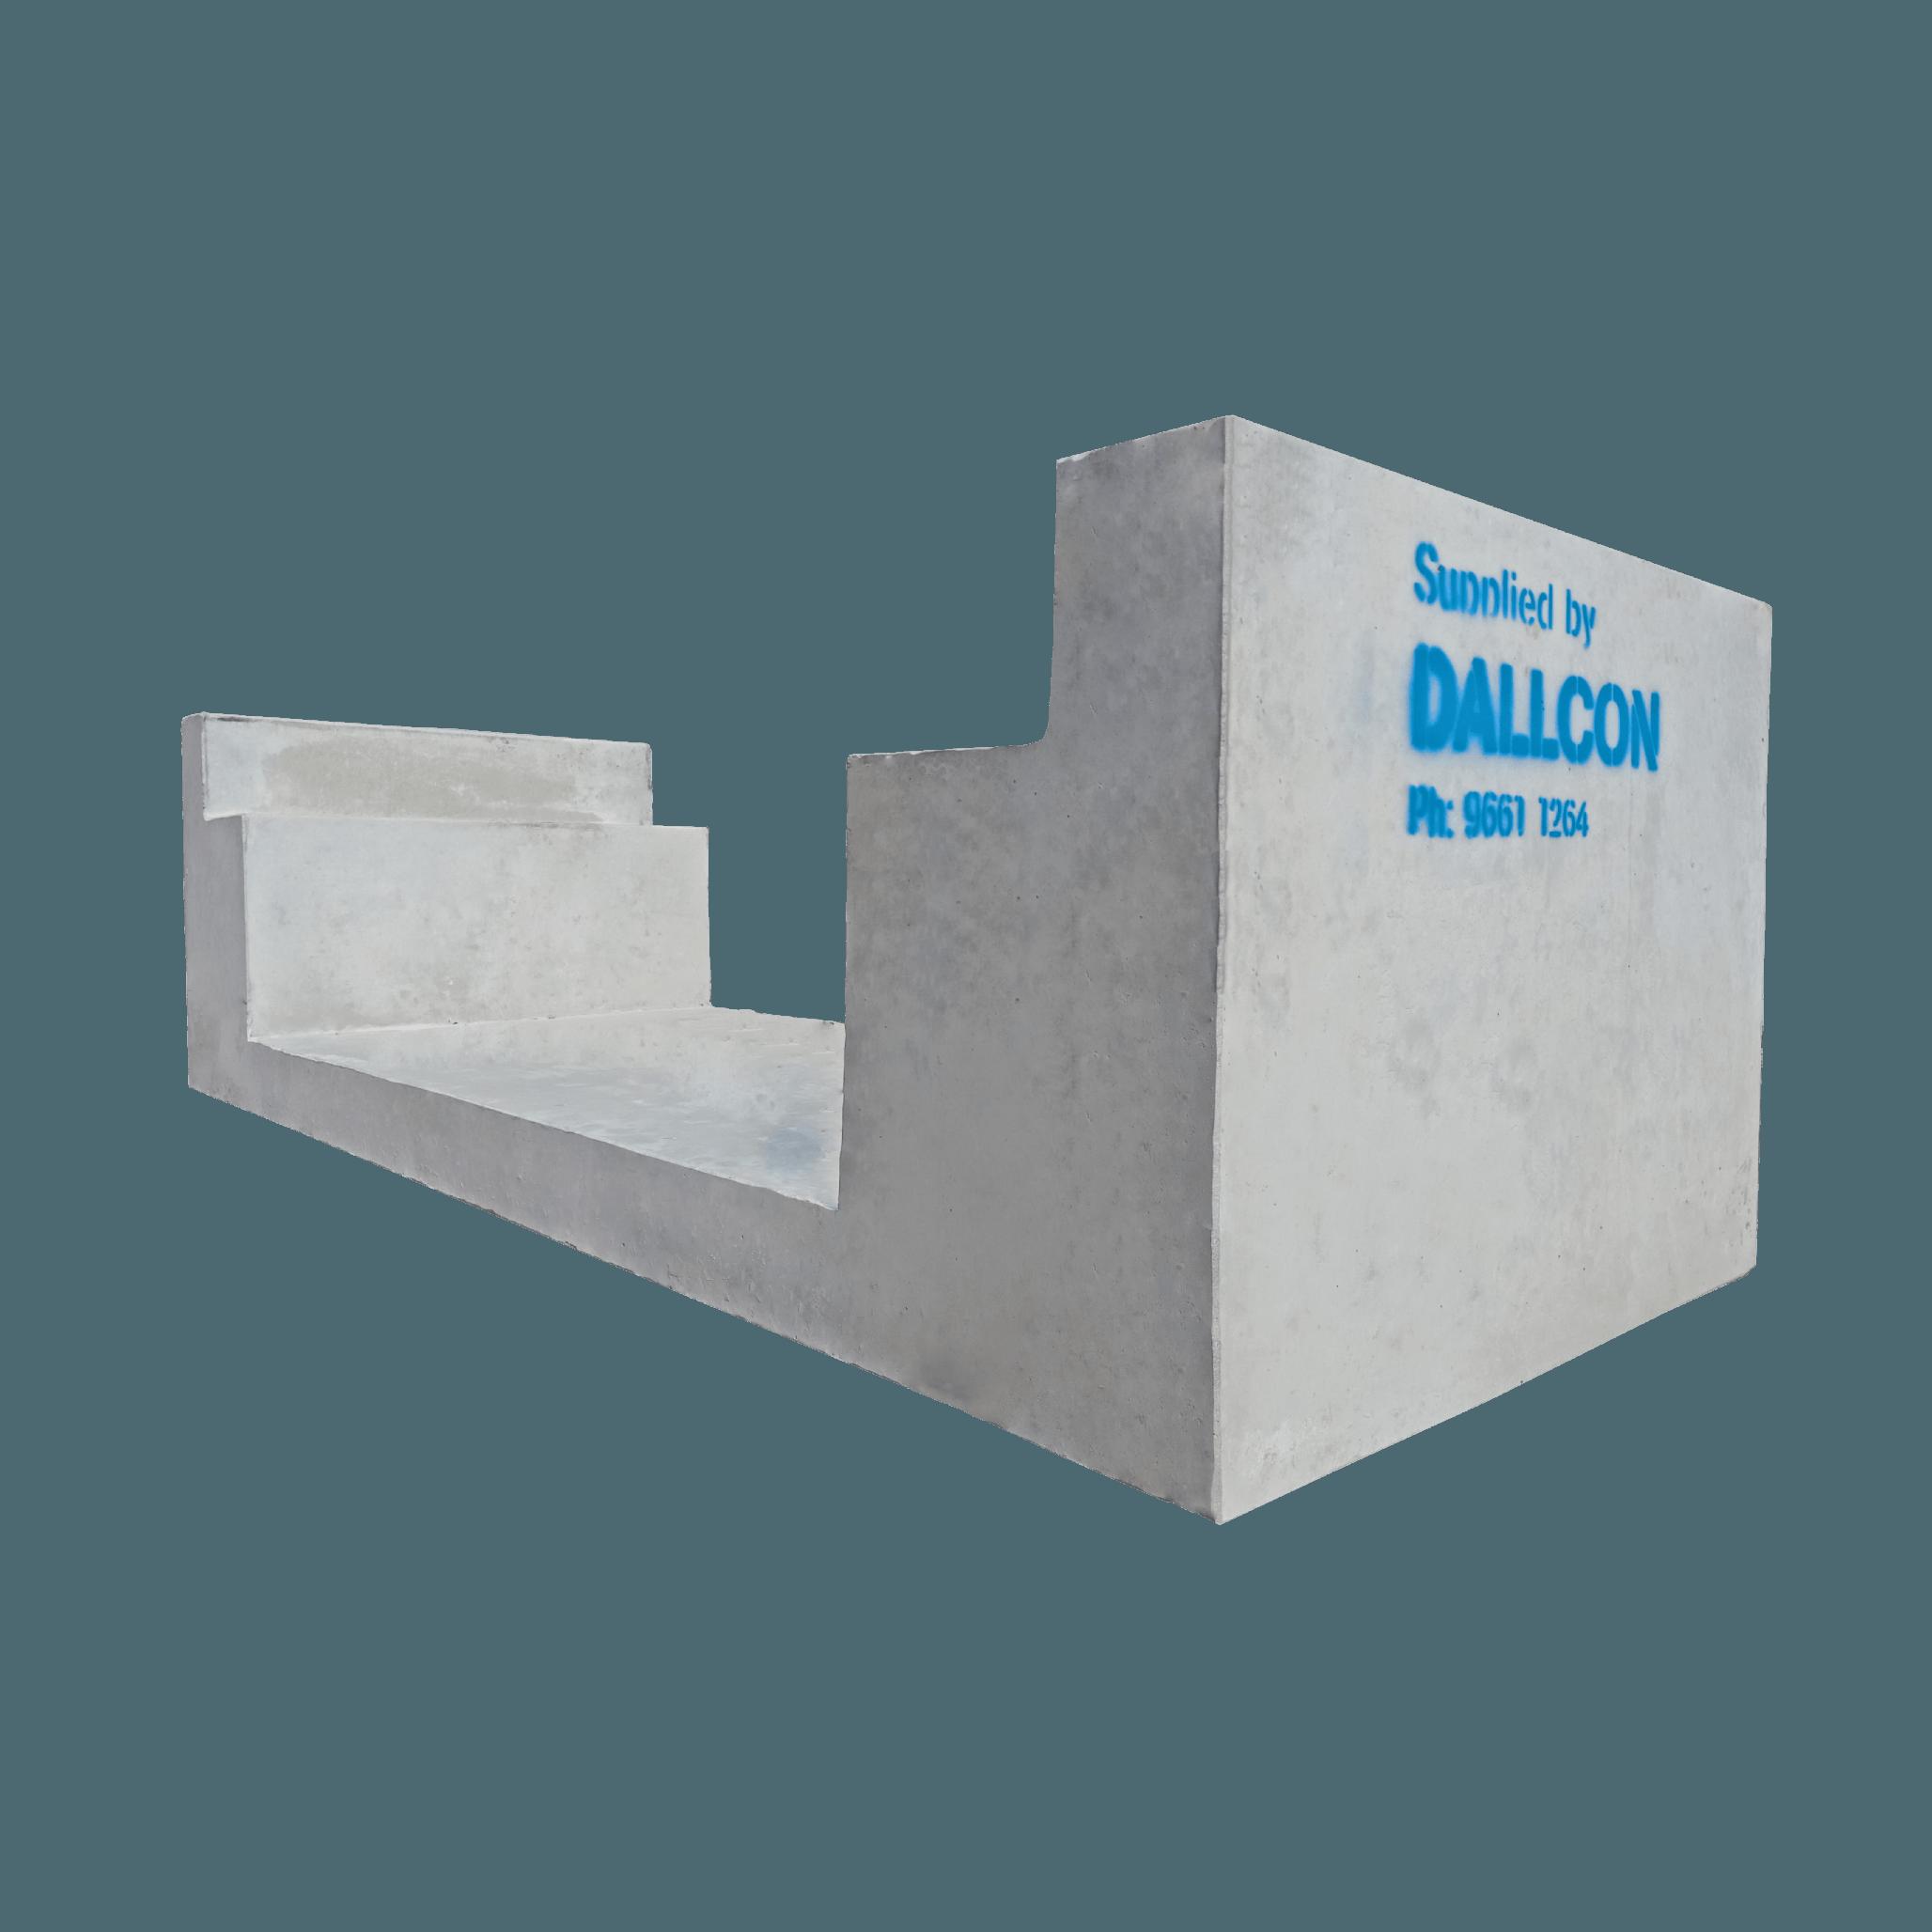 precast concrete cattle grids